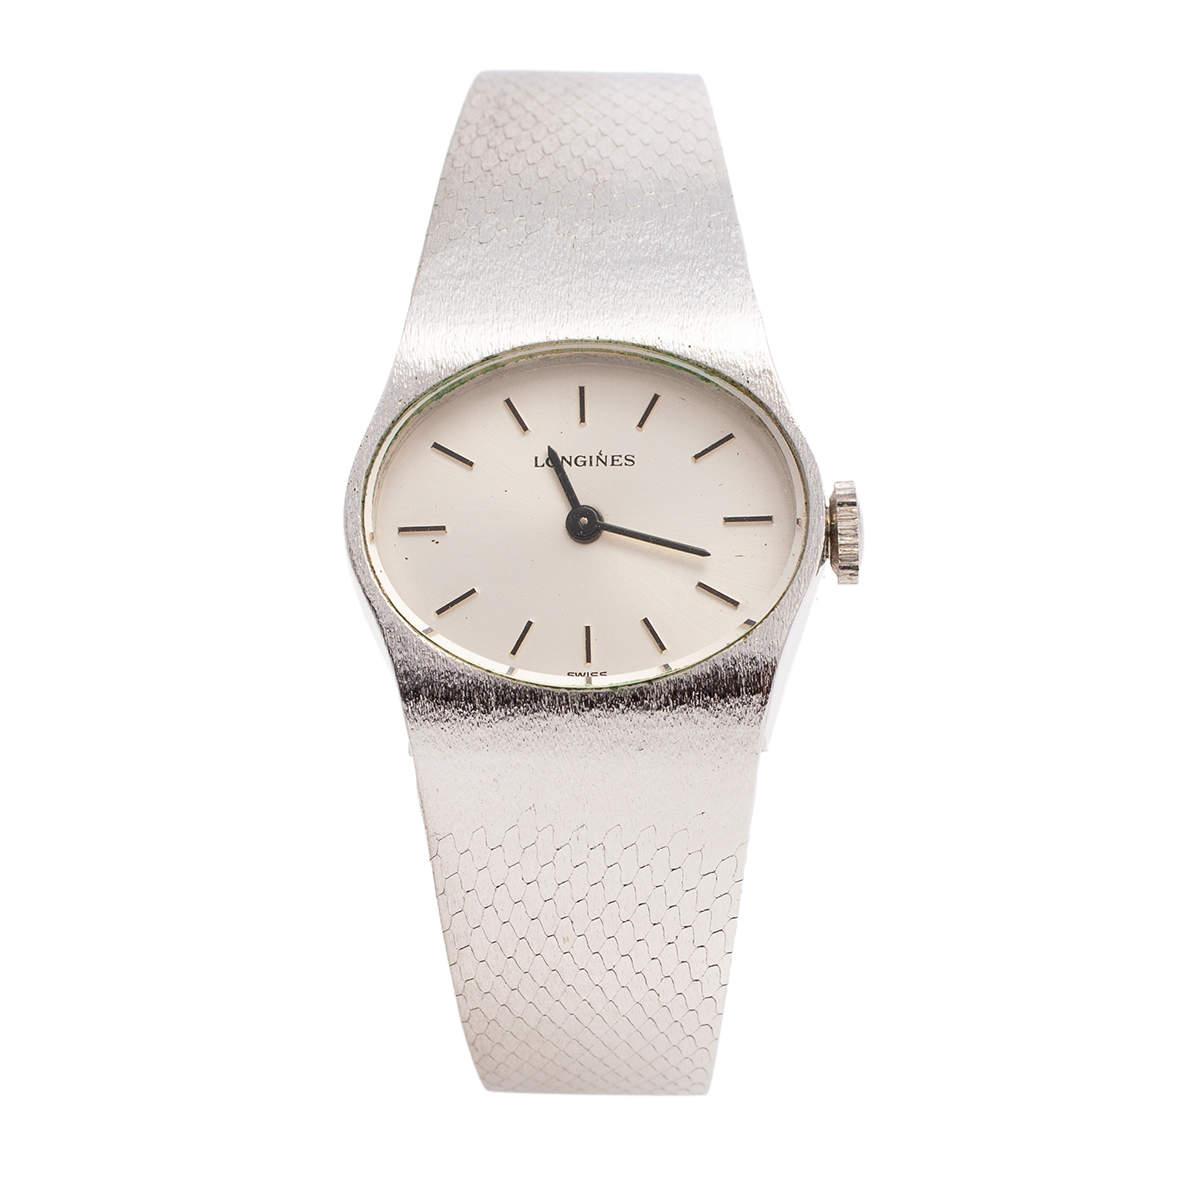 Longines Silver Stainless Steel OR4002-5602 Women's Wristwatch 22 mm